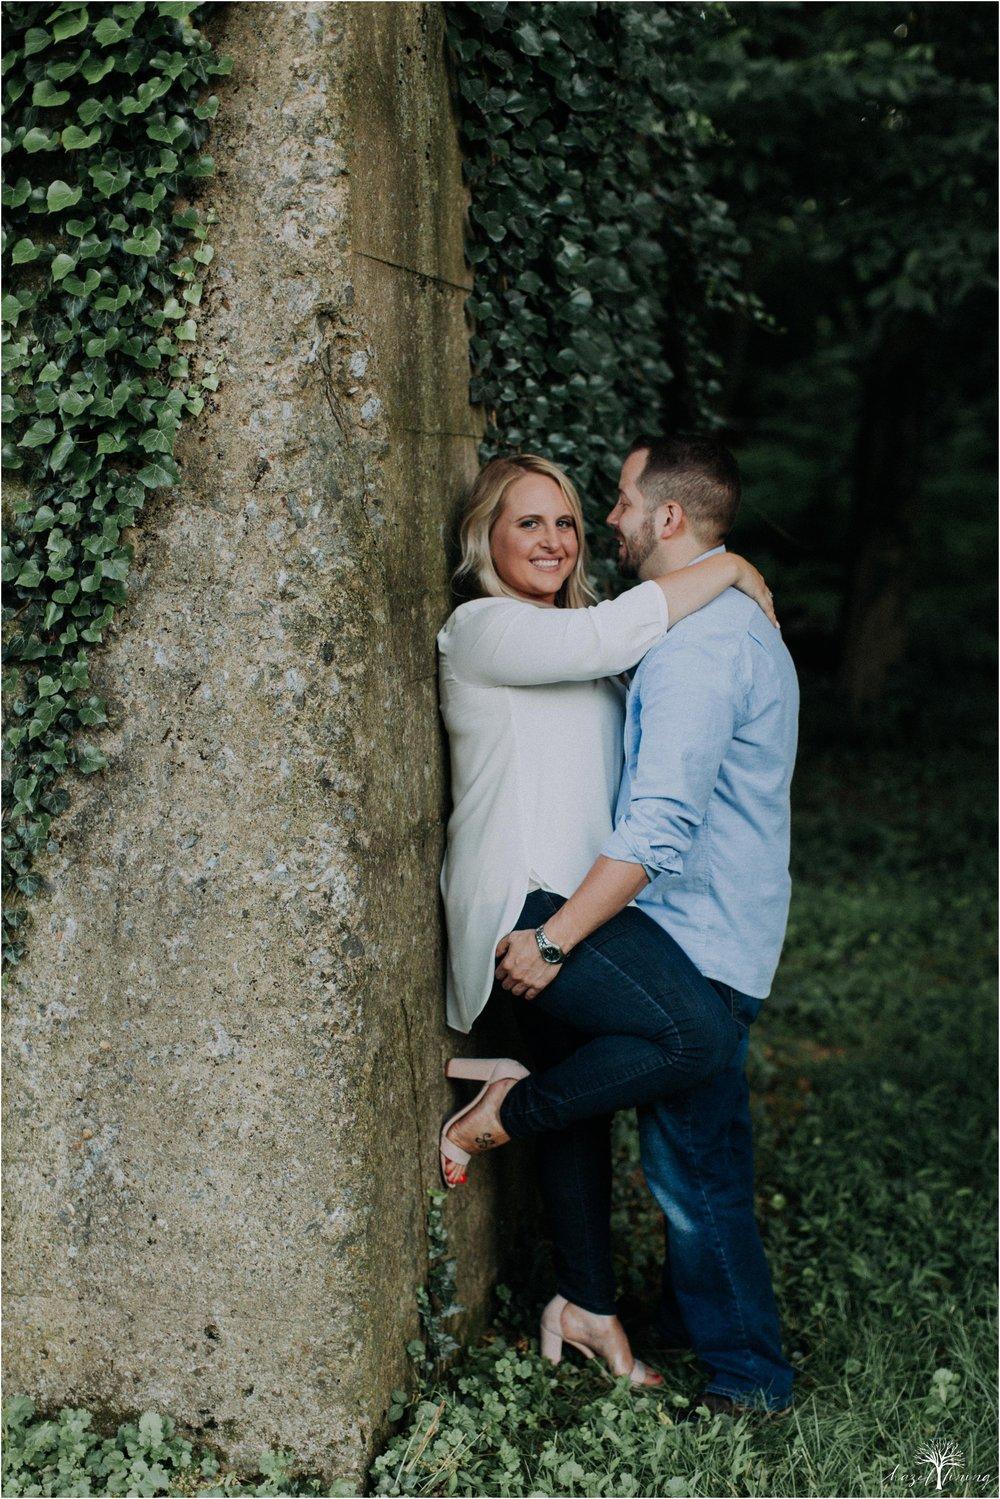 mel-mnich-john-butler-marietta-furnace-engagement-session-lancaster-county-pennsylvania-hazel-lining-travel-wedding-elopement-photography_0196.jpg